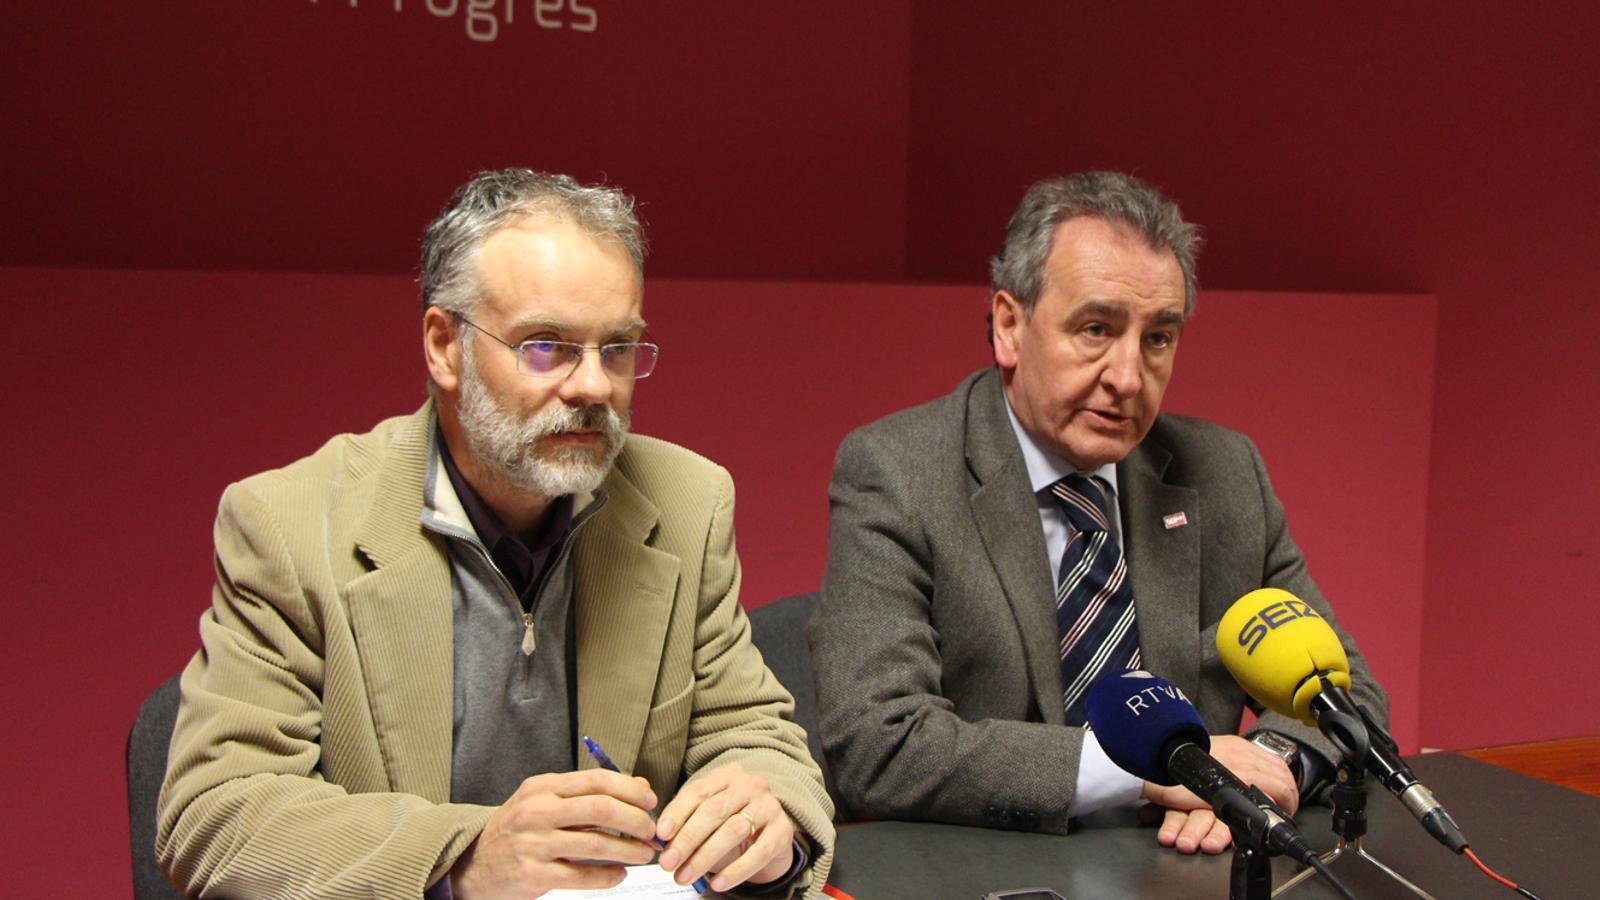 osep Roig i Jaume Bartumeu en roda de premsa / ARXIU ANA